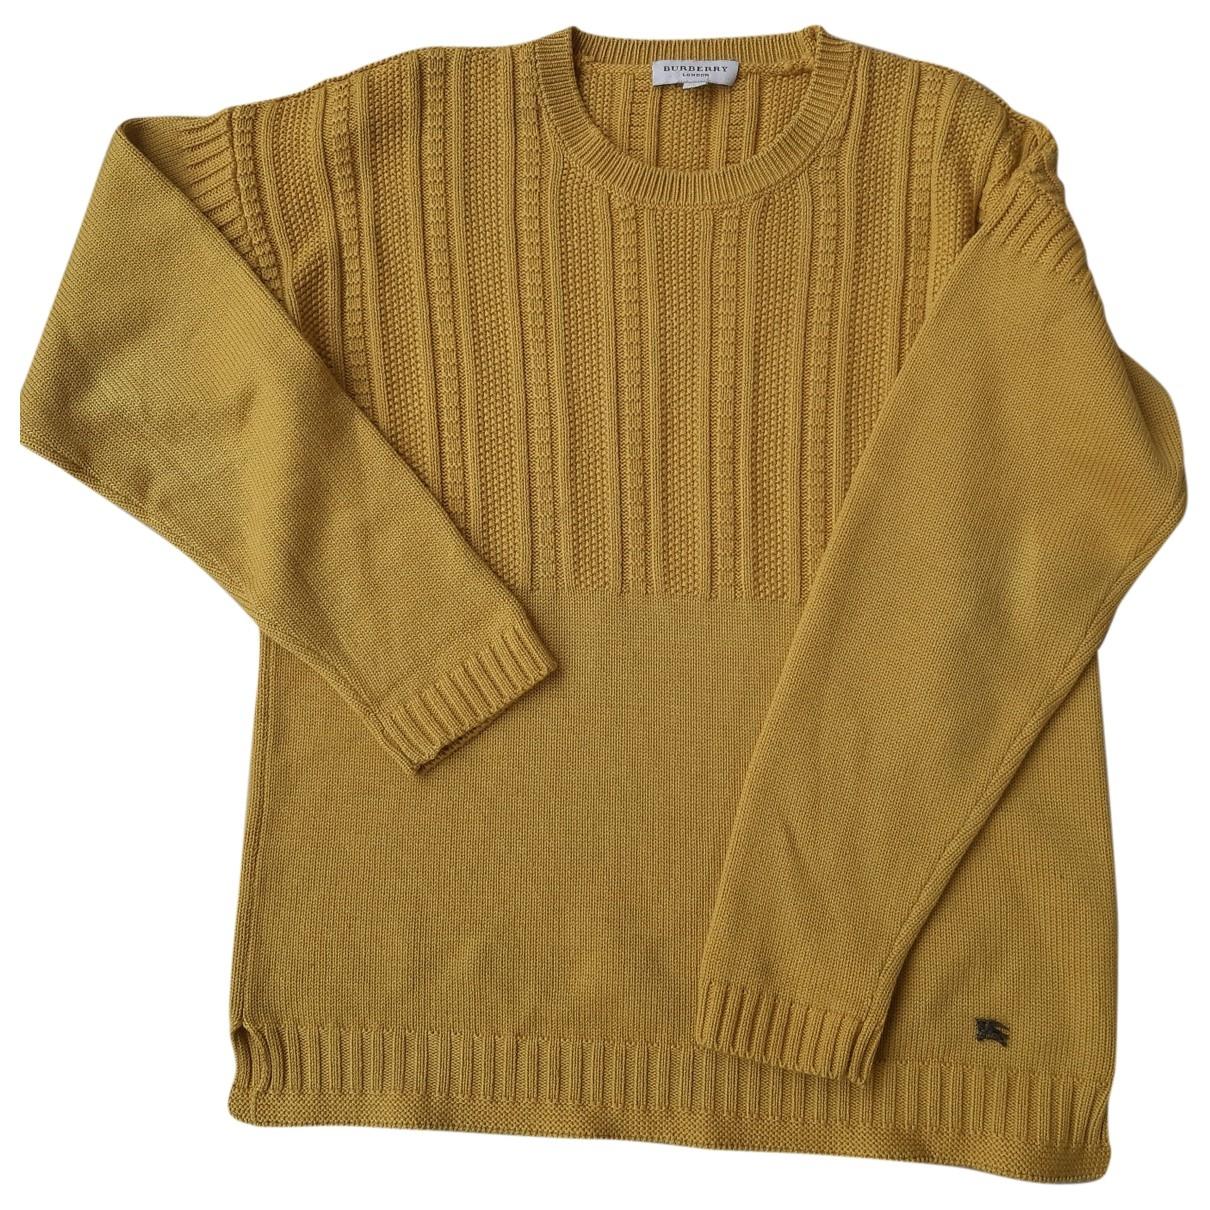 Burberry \N Yellow Cotton Knitwear for Women L International